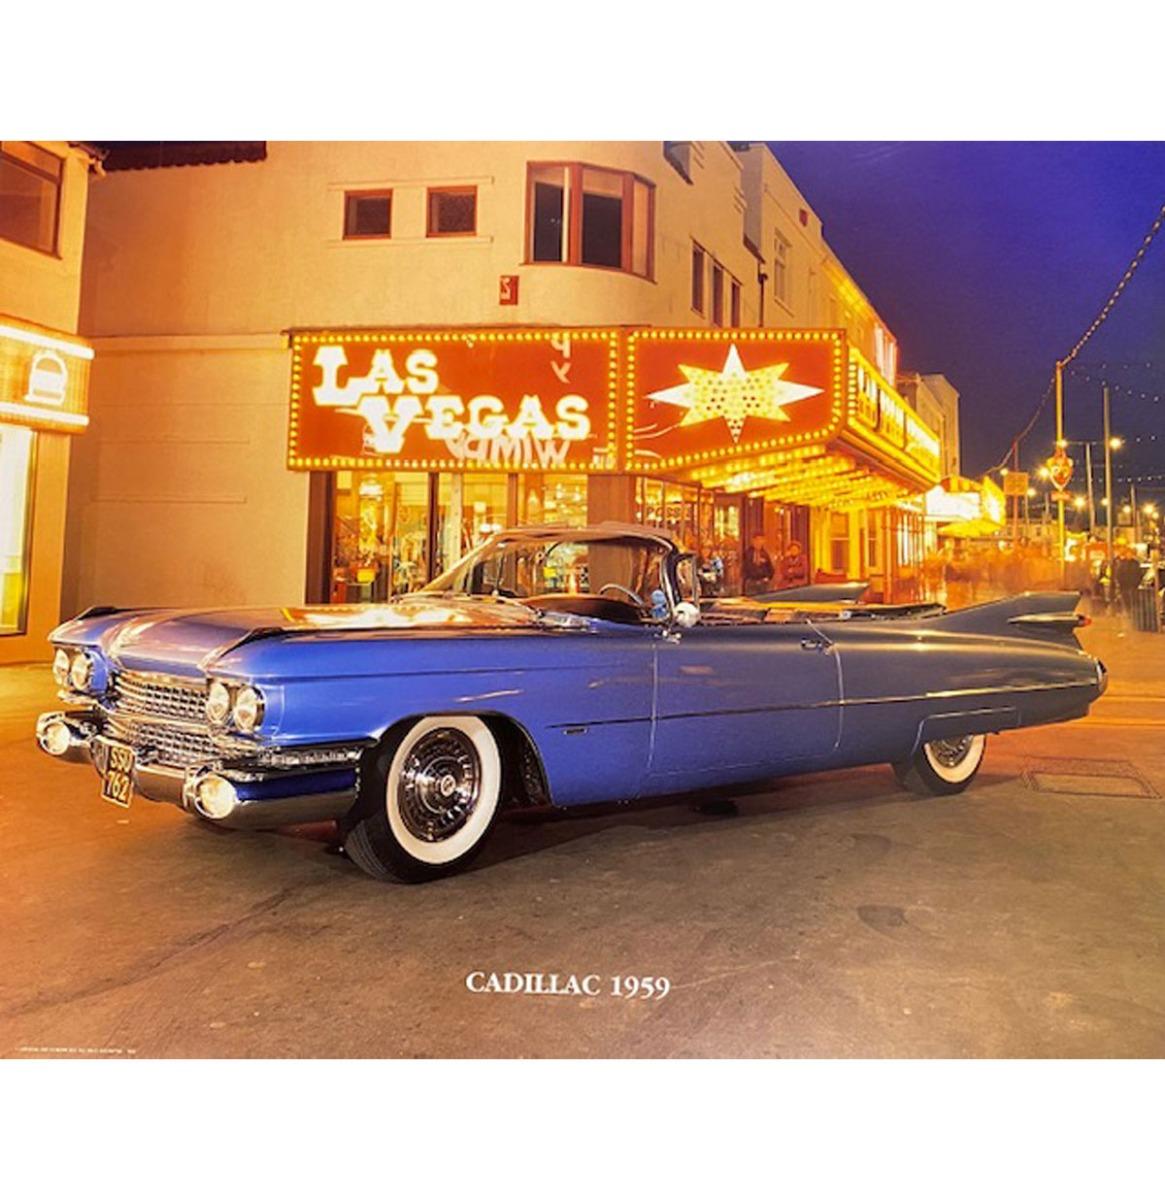 Auto Poster Cadillac 1959 40x50cm